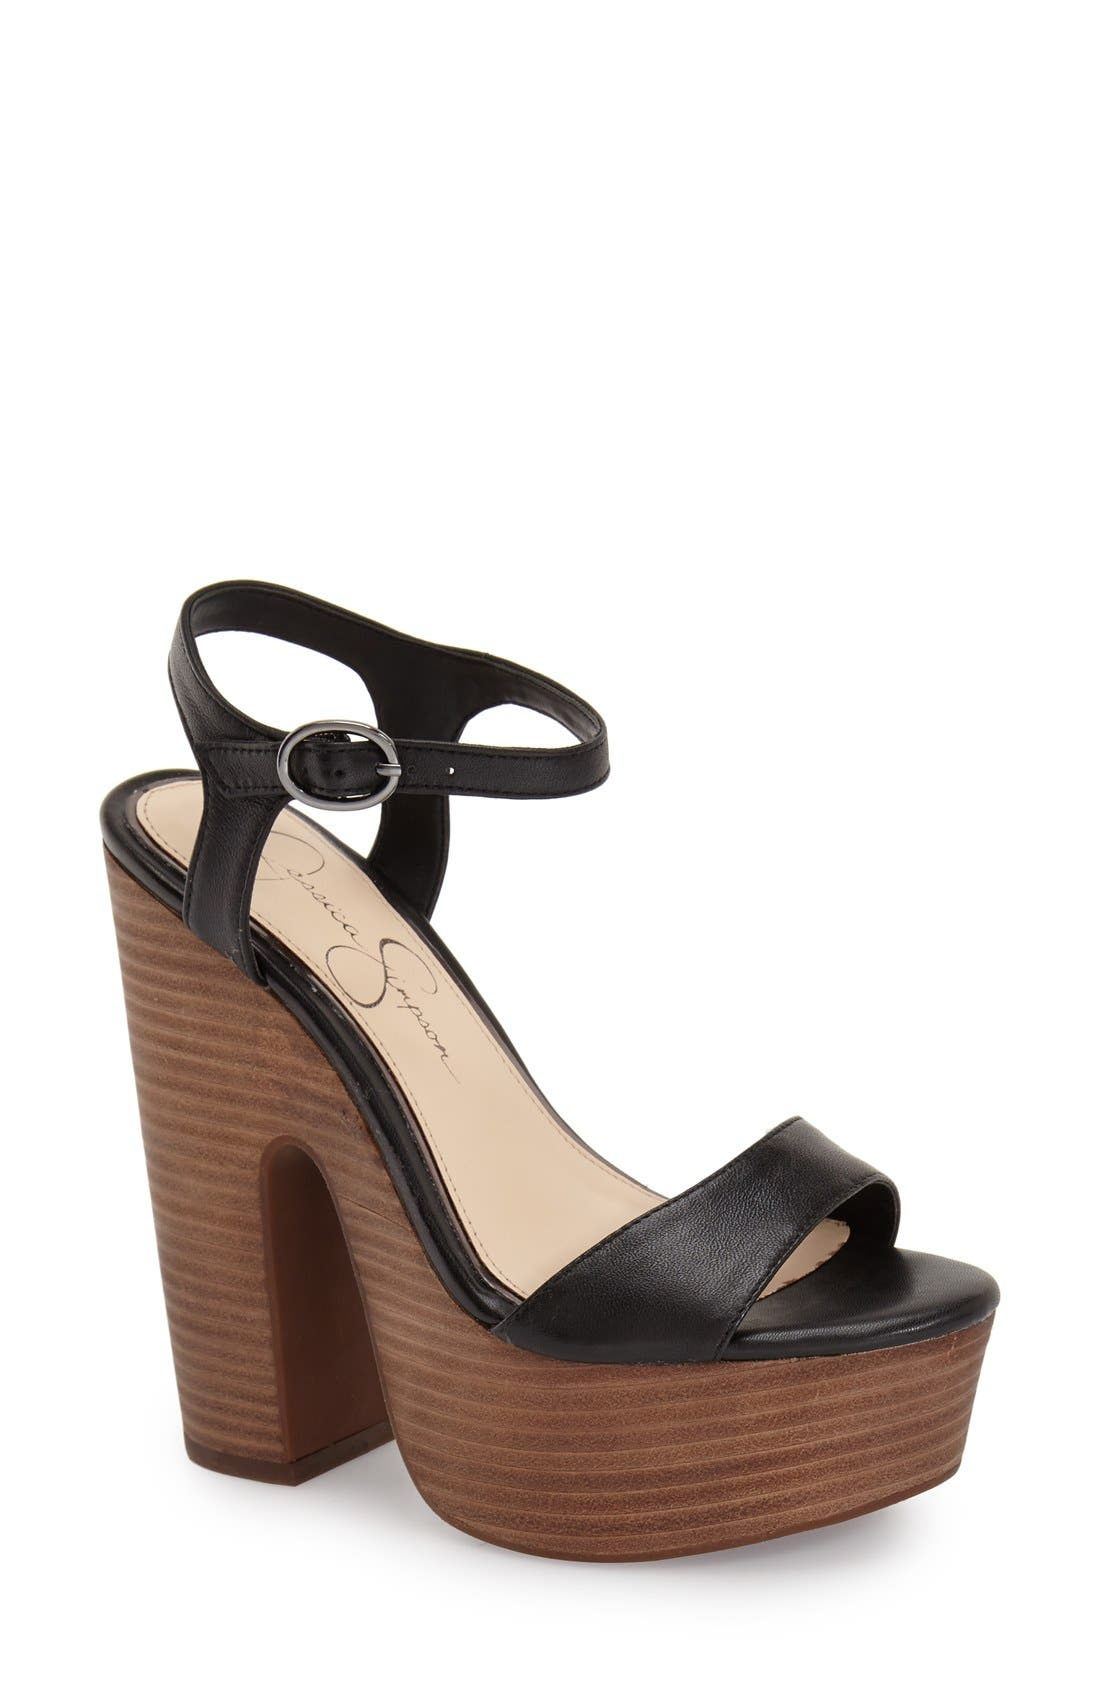 Alternate Image 1 Selected - Jessica Simpson 'Whirl' Platform Sandal (Women)